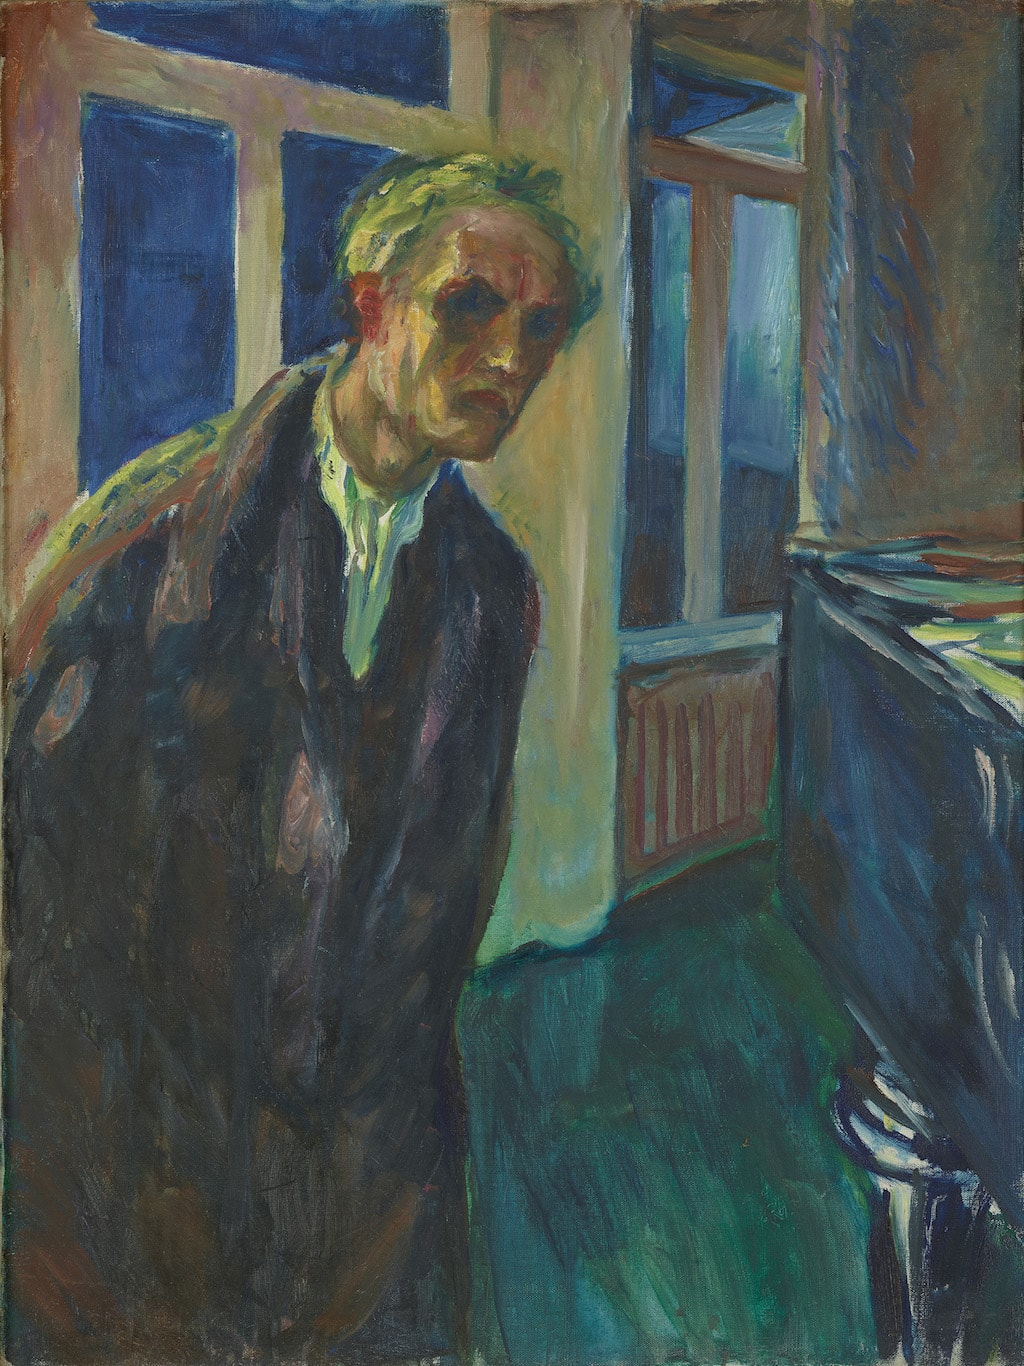 Edvard Munch, 'The Night Wanderer', 1923–1924 | © 2017 Artists Rights Society (ARS), New York / Munch Museum